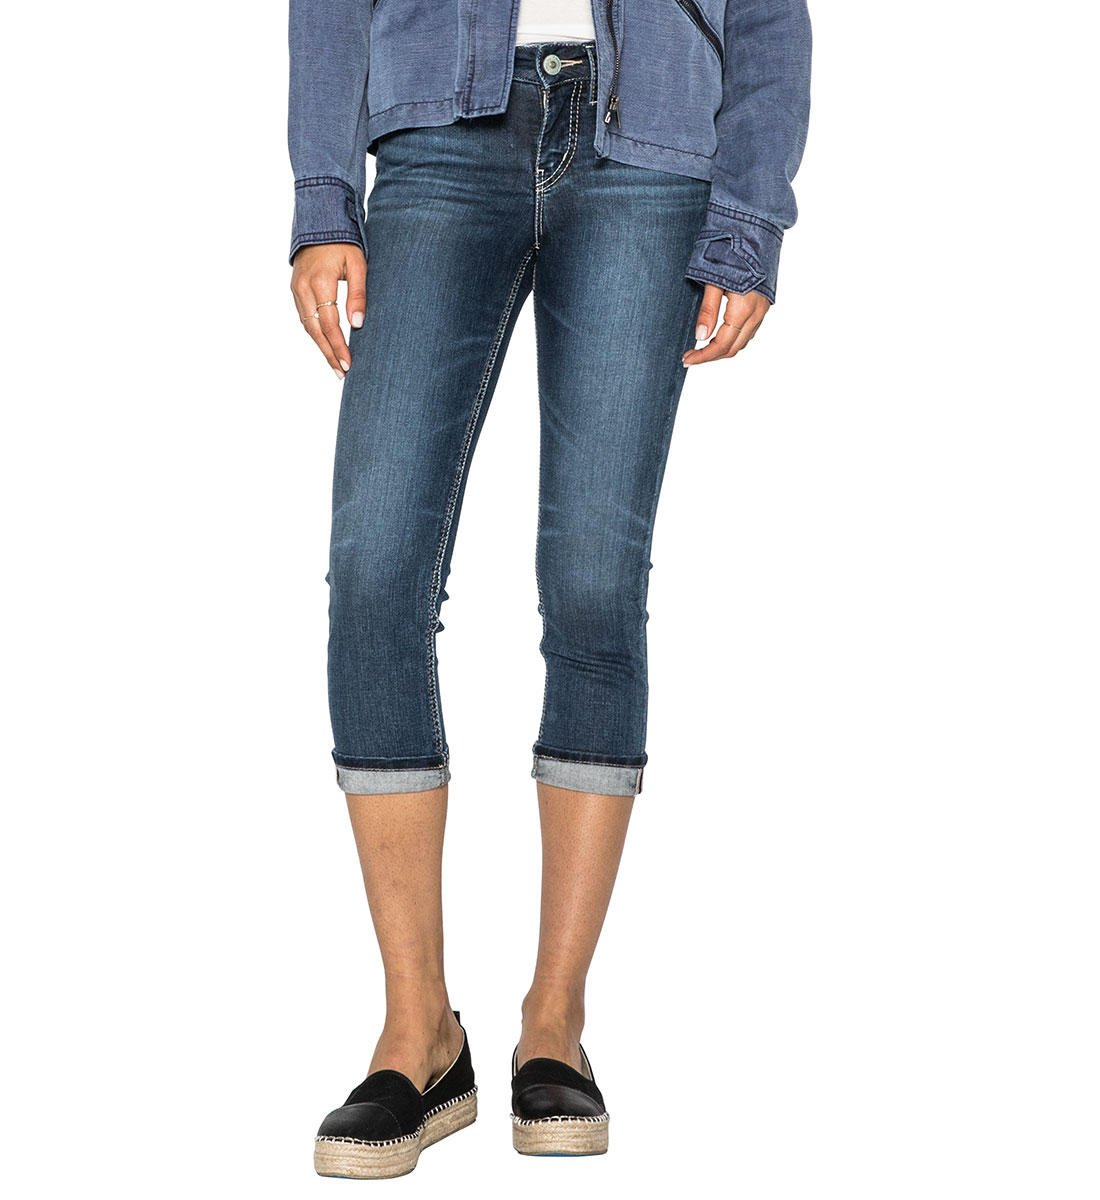 Silver Jeans Co. Women's Suki Curvy Fit Mid Rise Capri Silver Jeans Juniors L43920SSX460